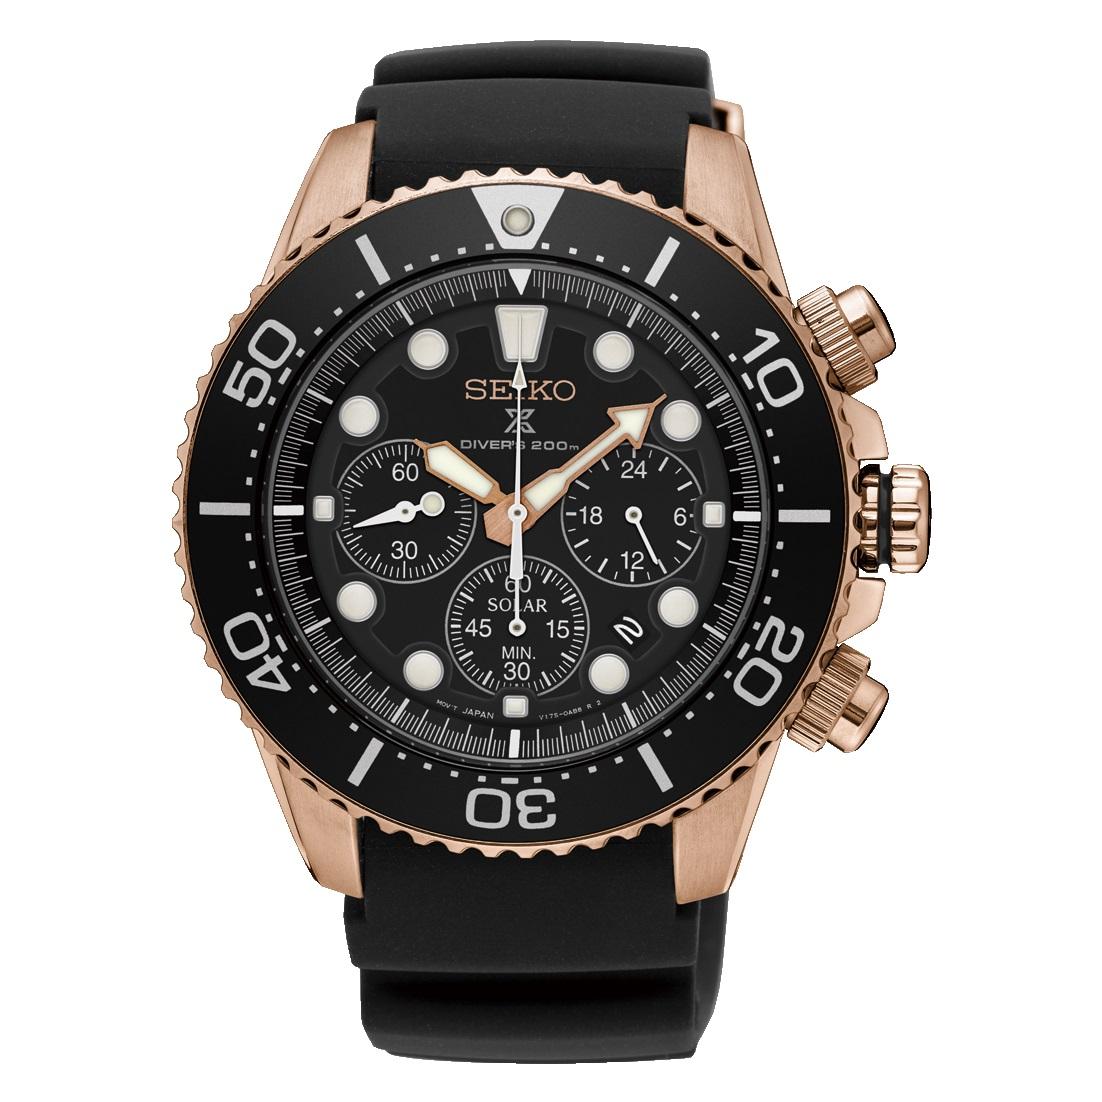 ساعت مچی عقربه ای مردانه سیکو  مدل   SSC618P1